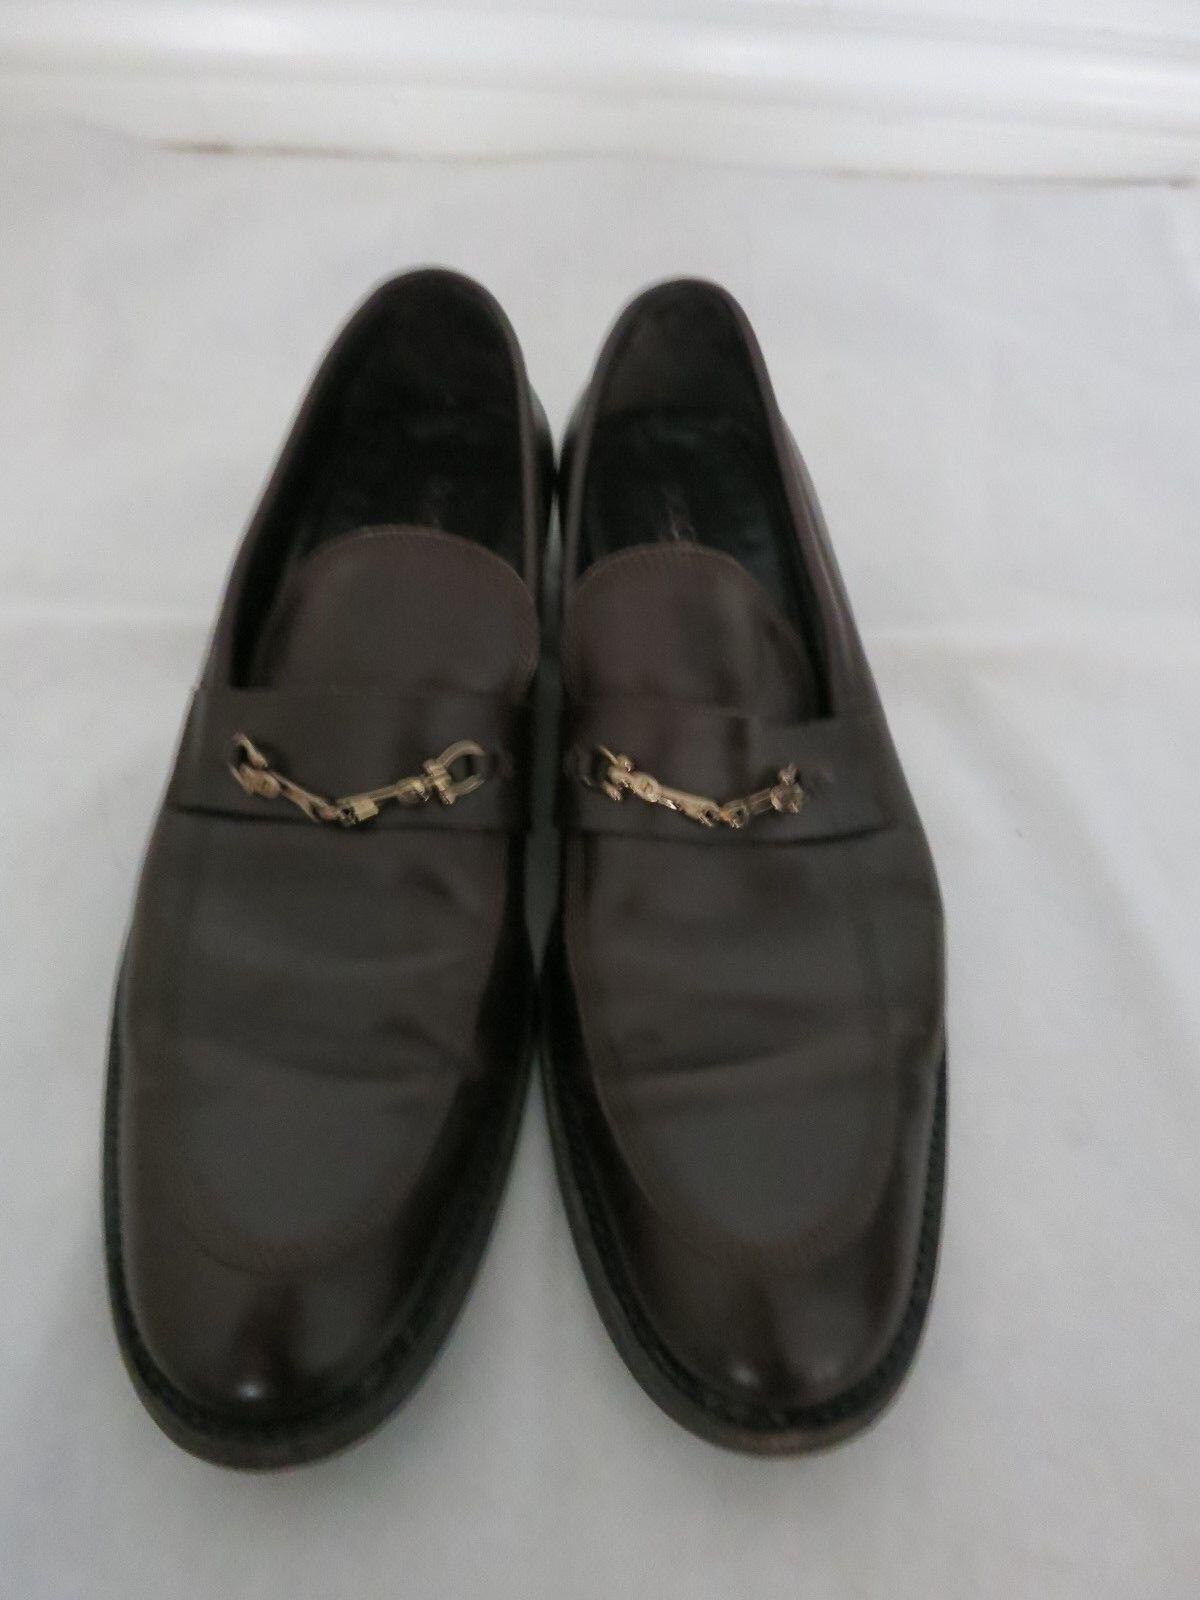 DOLCE AND 11 GABBANA Braun loafer Größe 11 AND 351d84